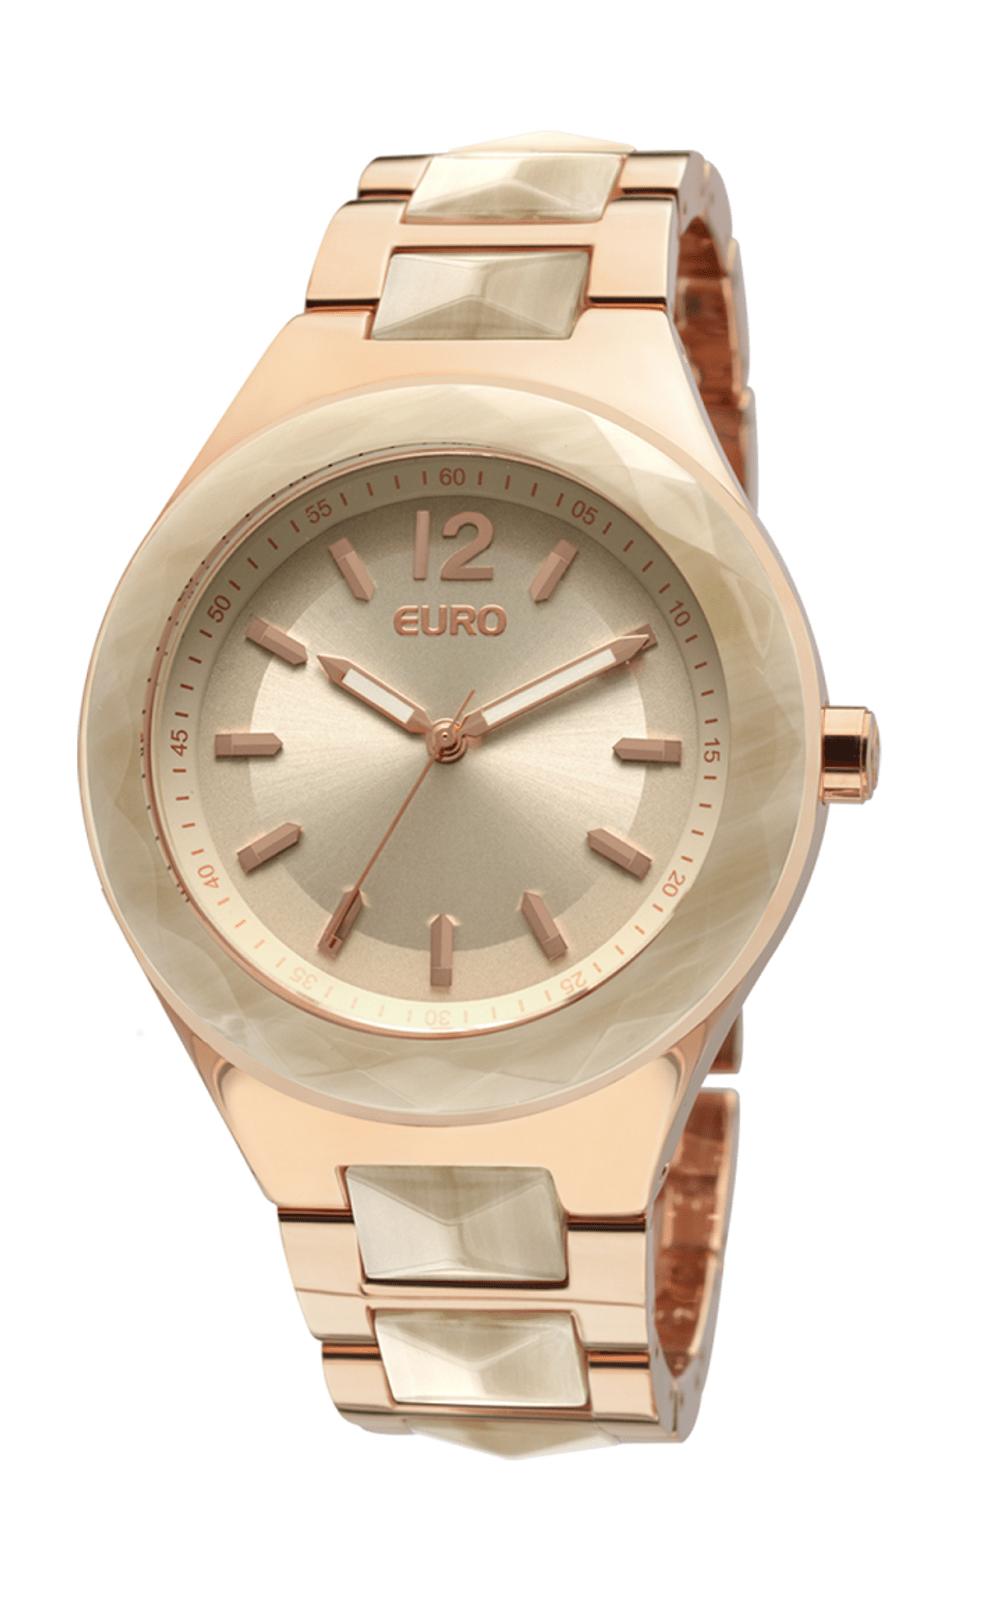 Relógio Euro Feminino Vannes EU2035LRD 4T - Rose Gold. undefined 0ef6f27aa1